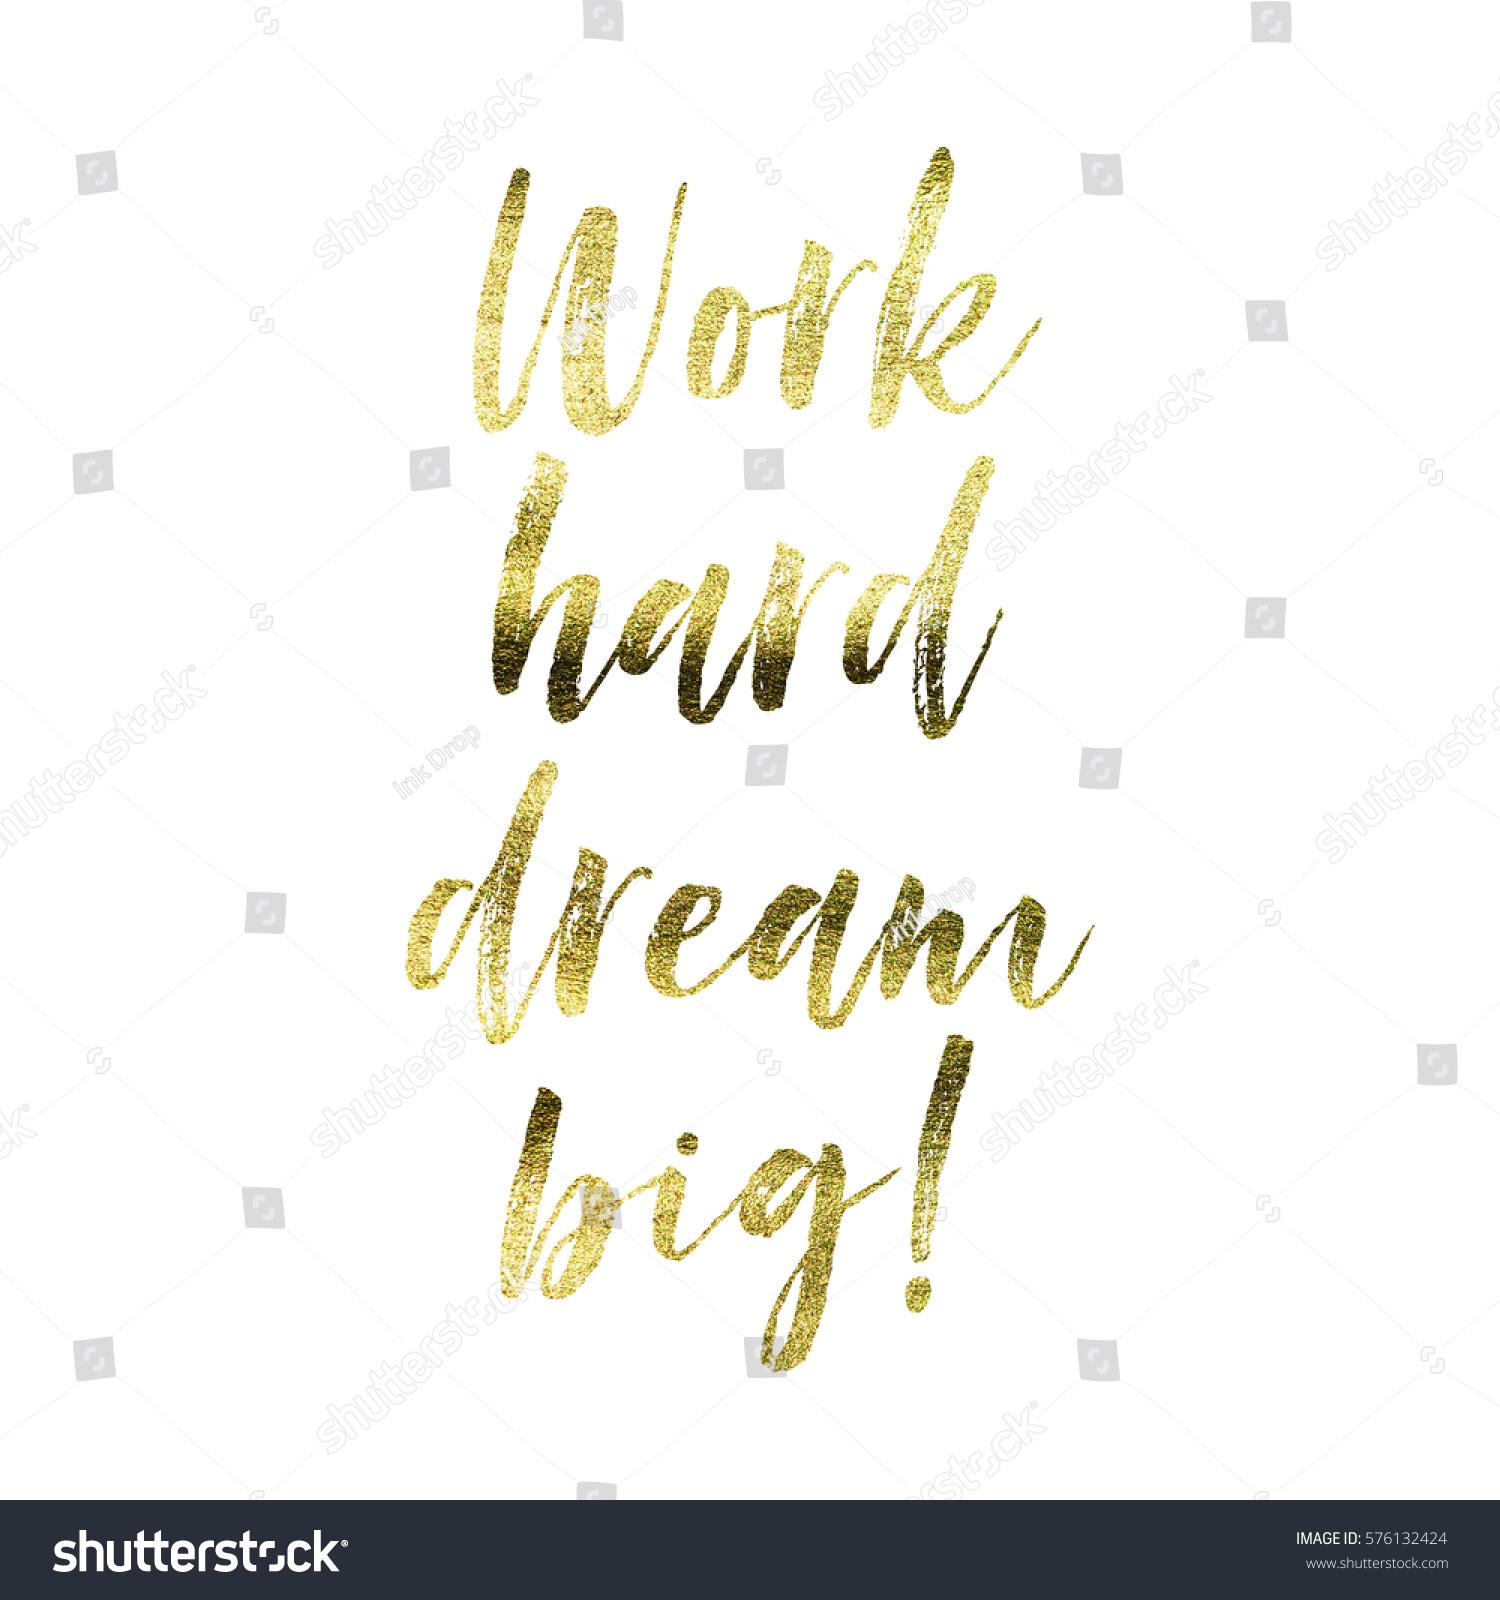 Royalty Free Stock Illustration Of Work Hard Dream Big Gold Foil